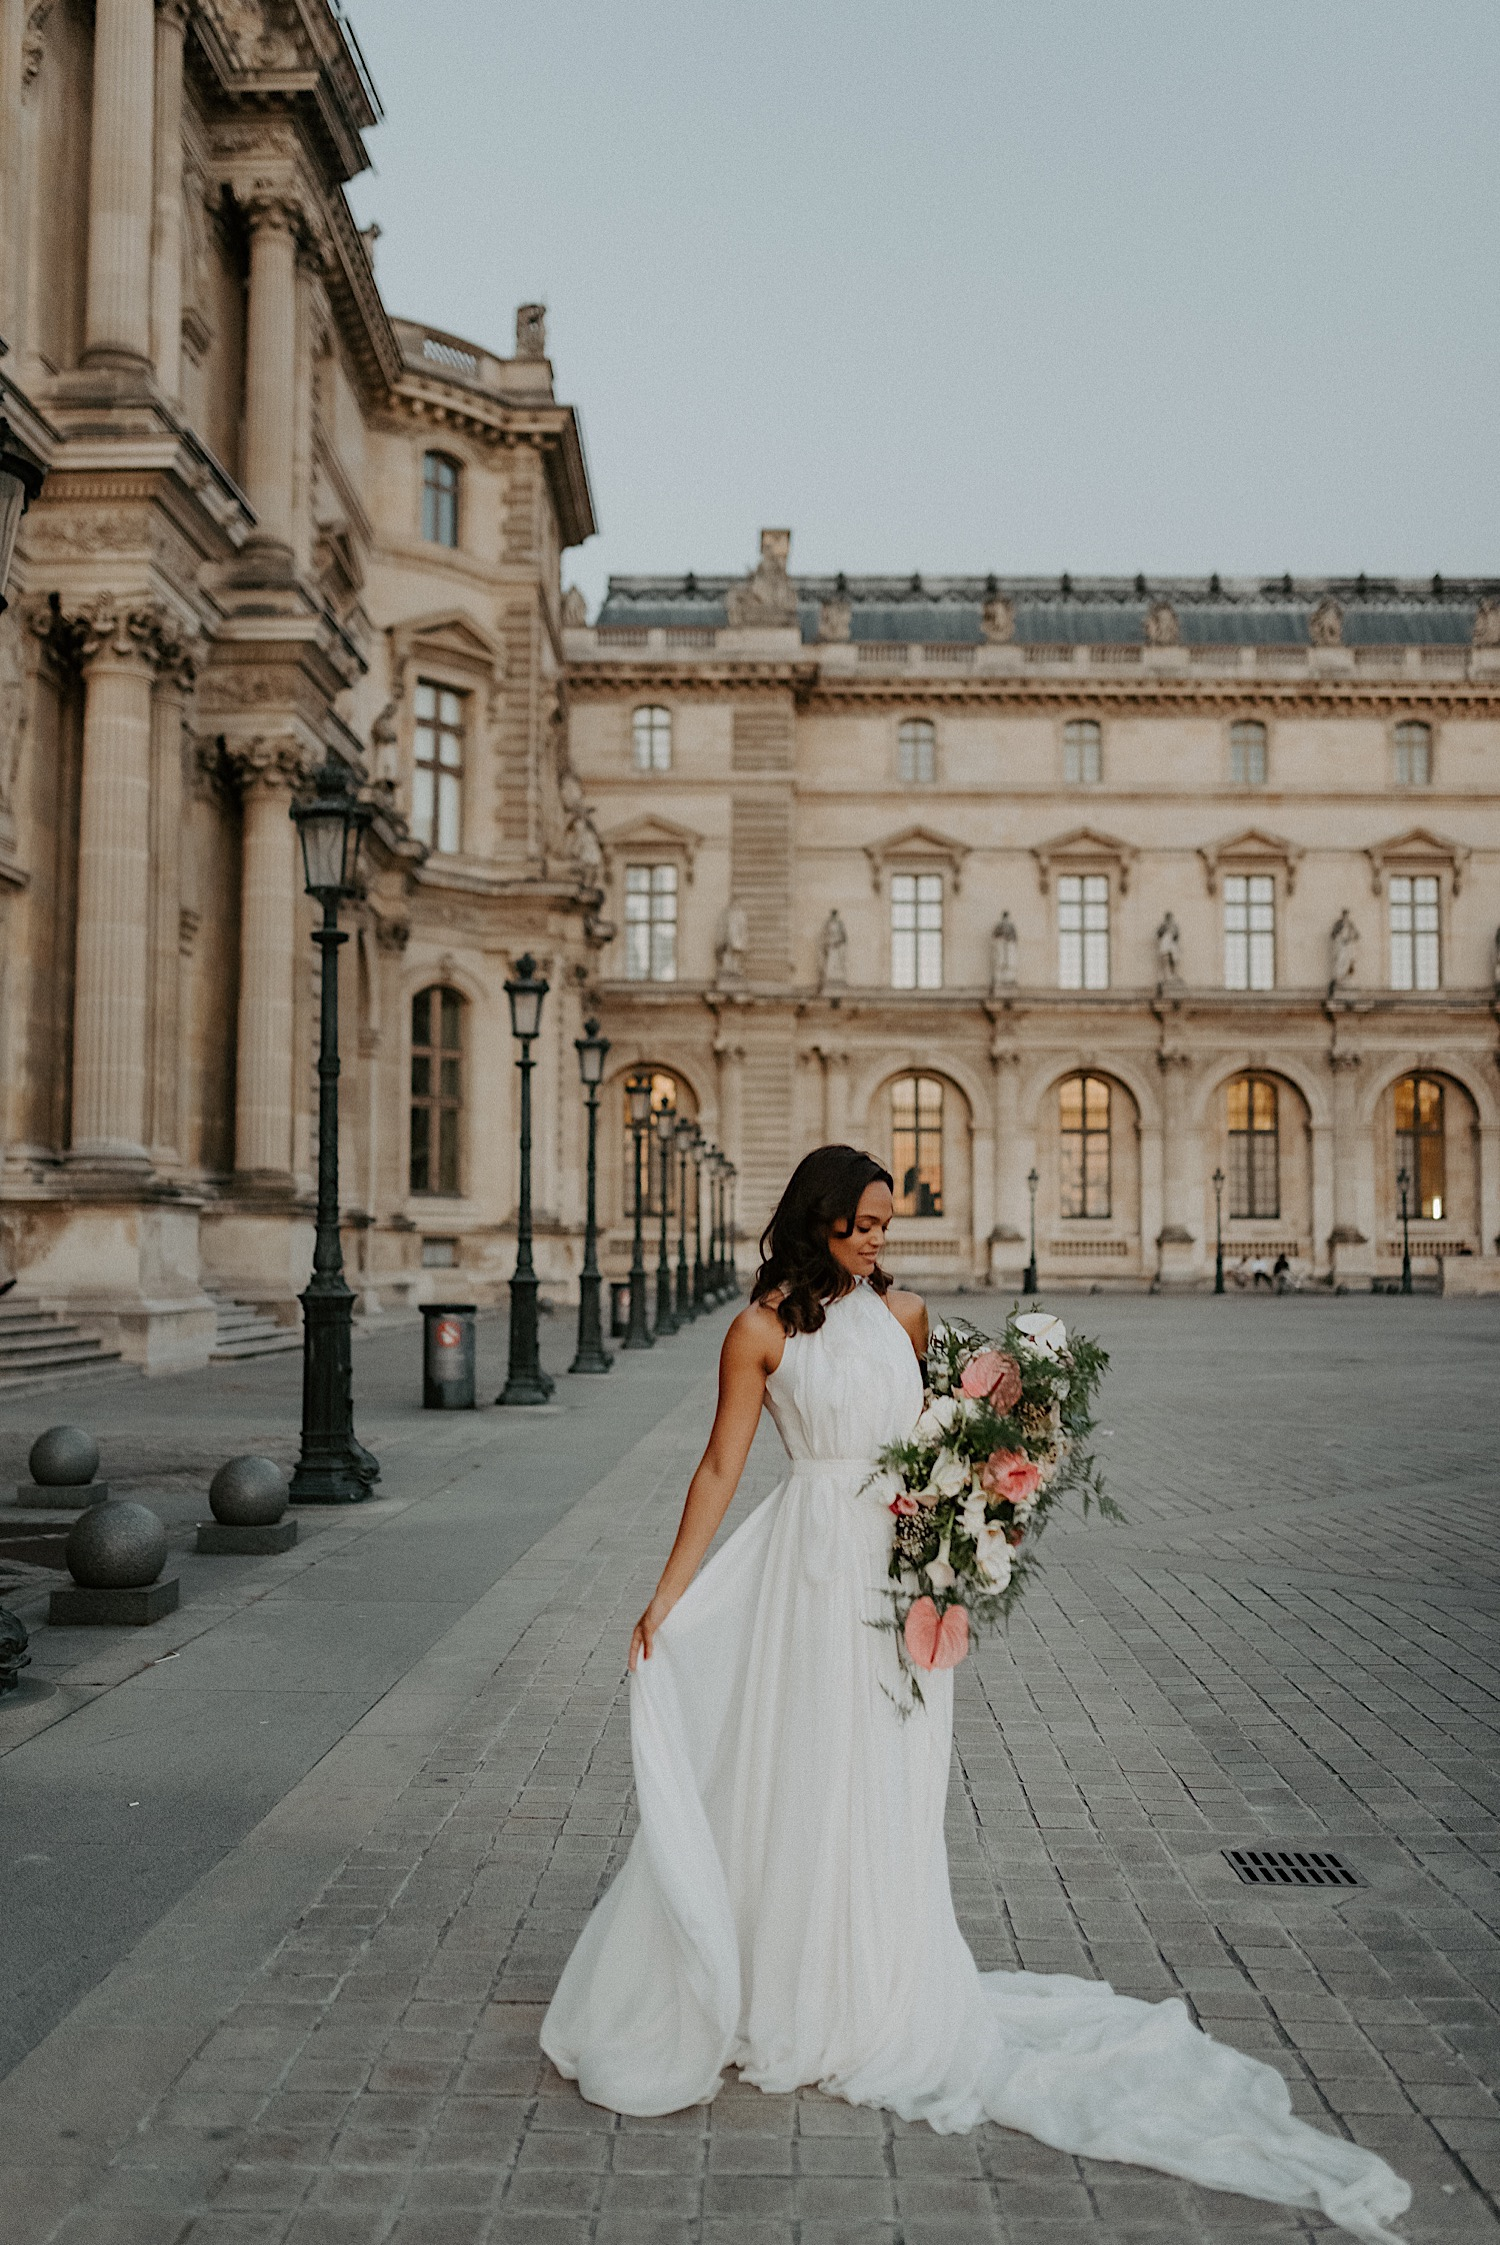 Paris Louvre Wedding Photos Paris Wedding Photographer Destination Wedding France Anais Possamai Photography 34